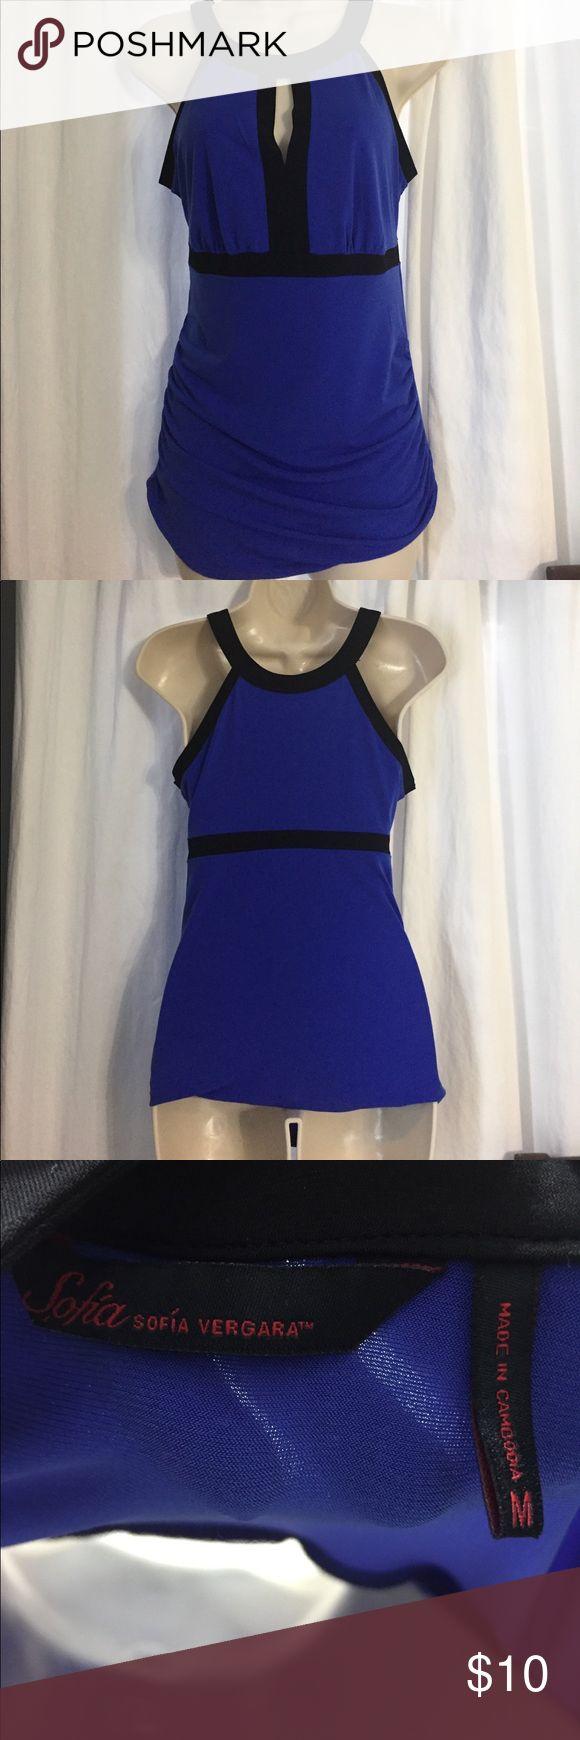 Royal Blue and black dress shirt Royal blue and black blouse by Sofia Vergara size Medium. Worn once. Like new Sofia Vergara Tops Blouses